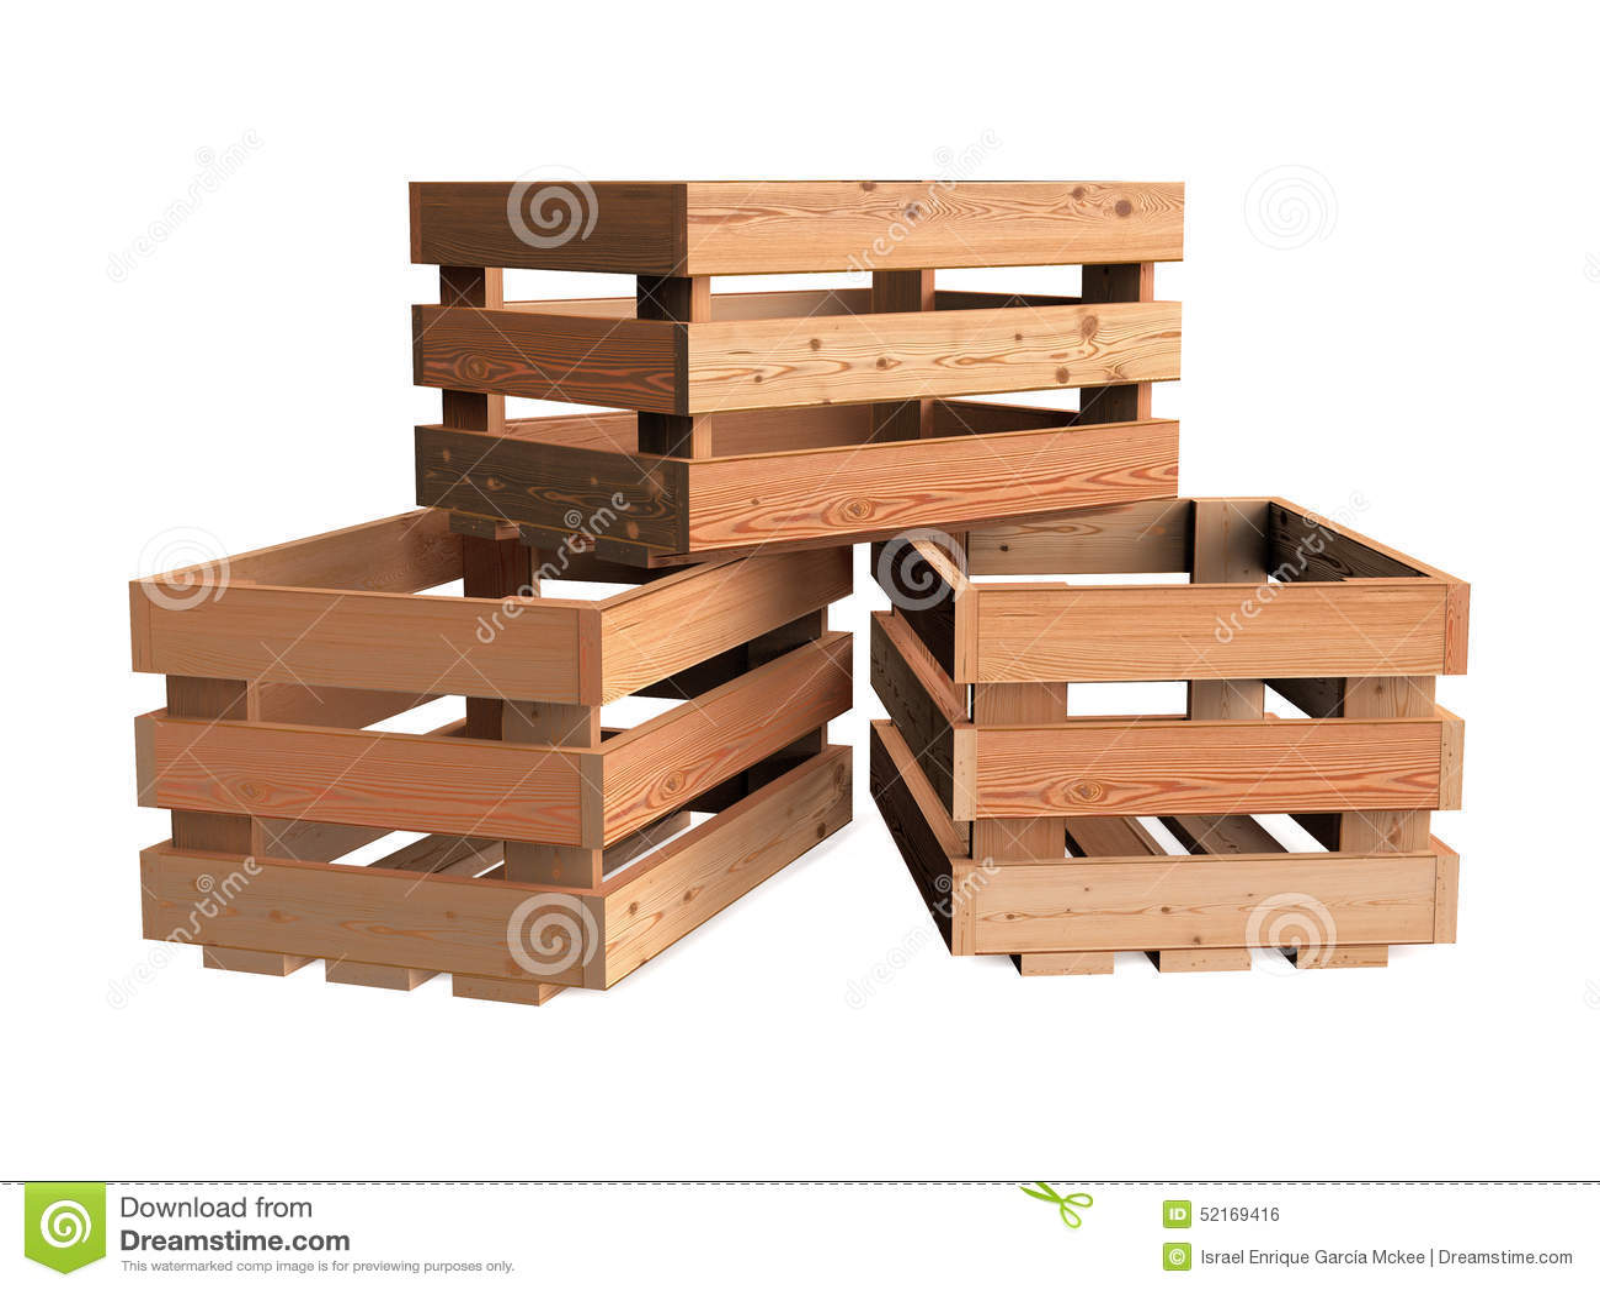 Mont n de cajones de madera stock de ilustraci n imagen - Cajones de fruta de madera ...